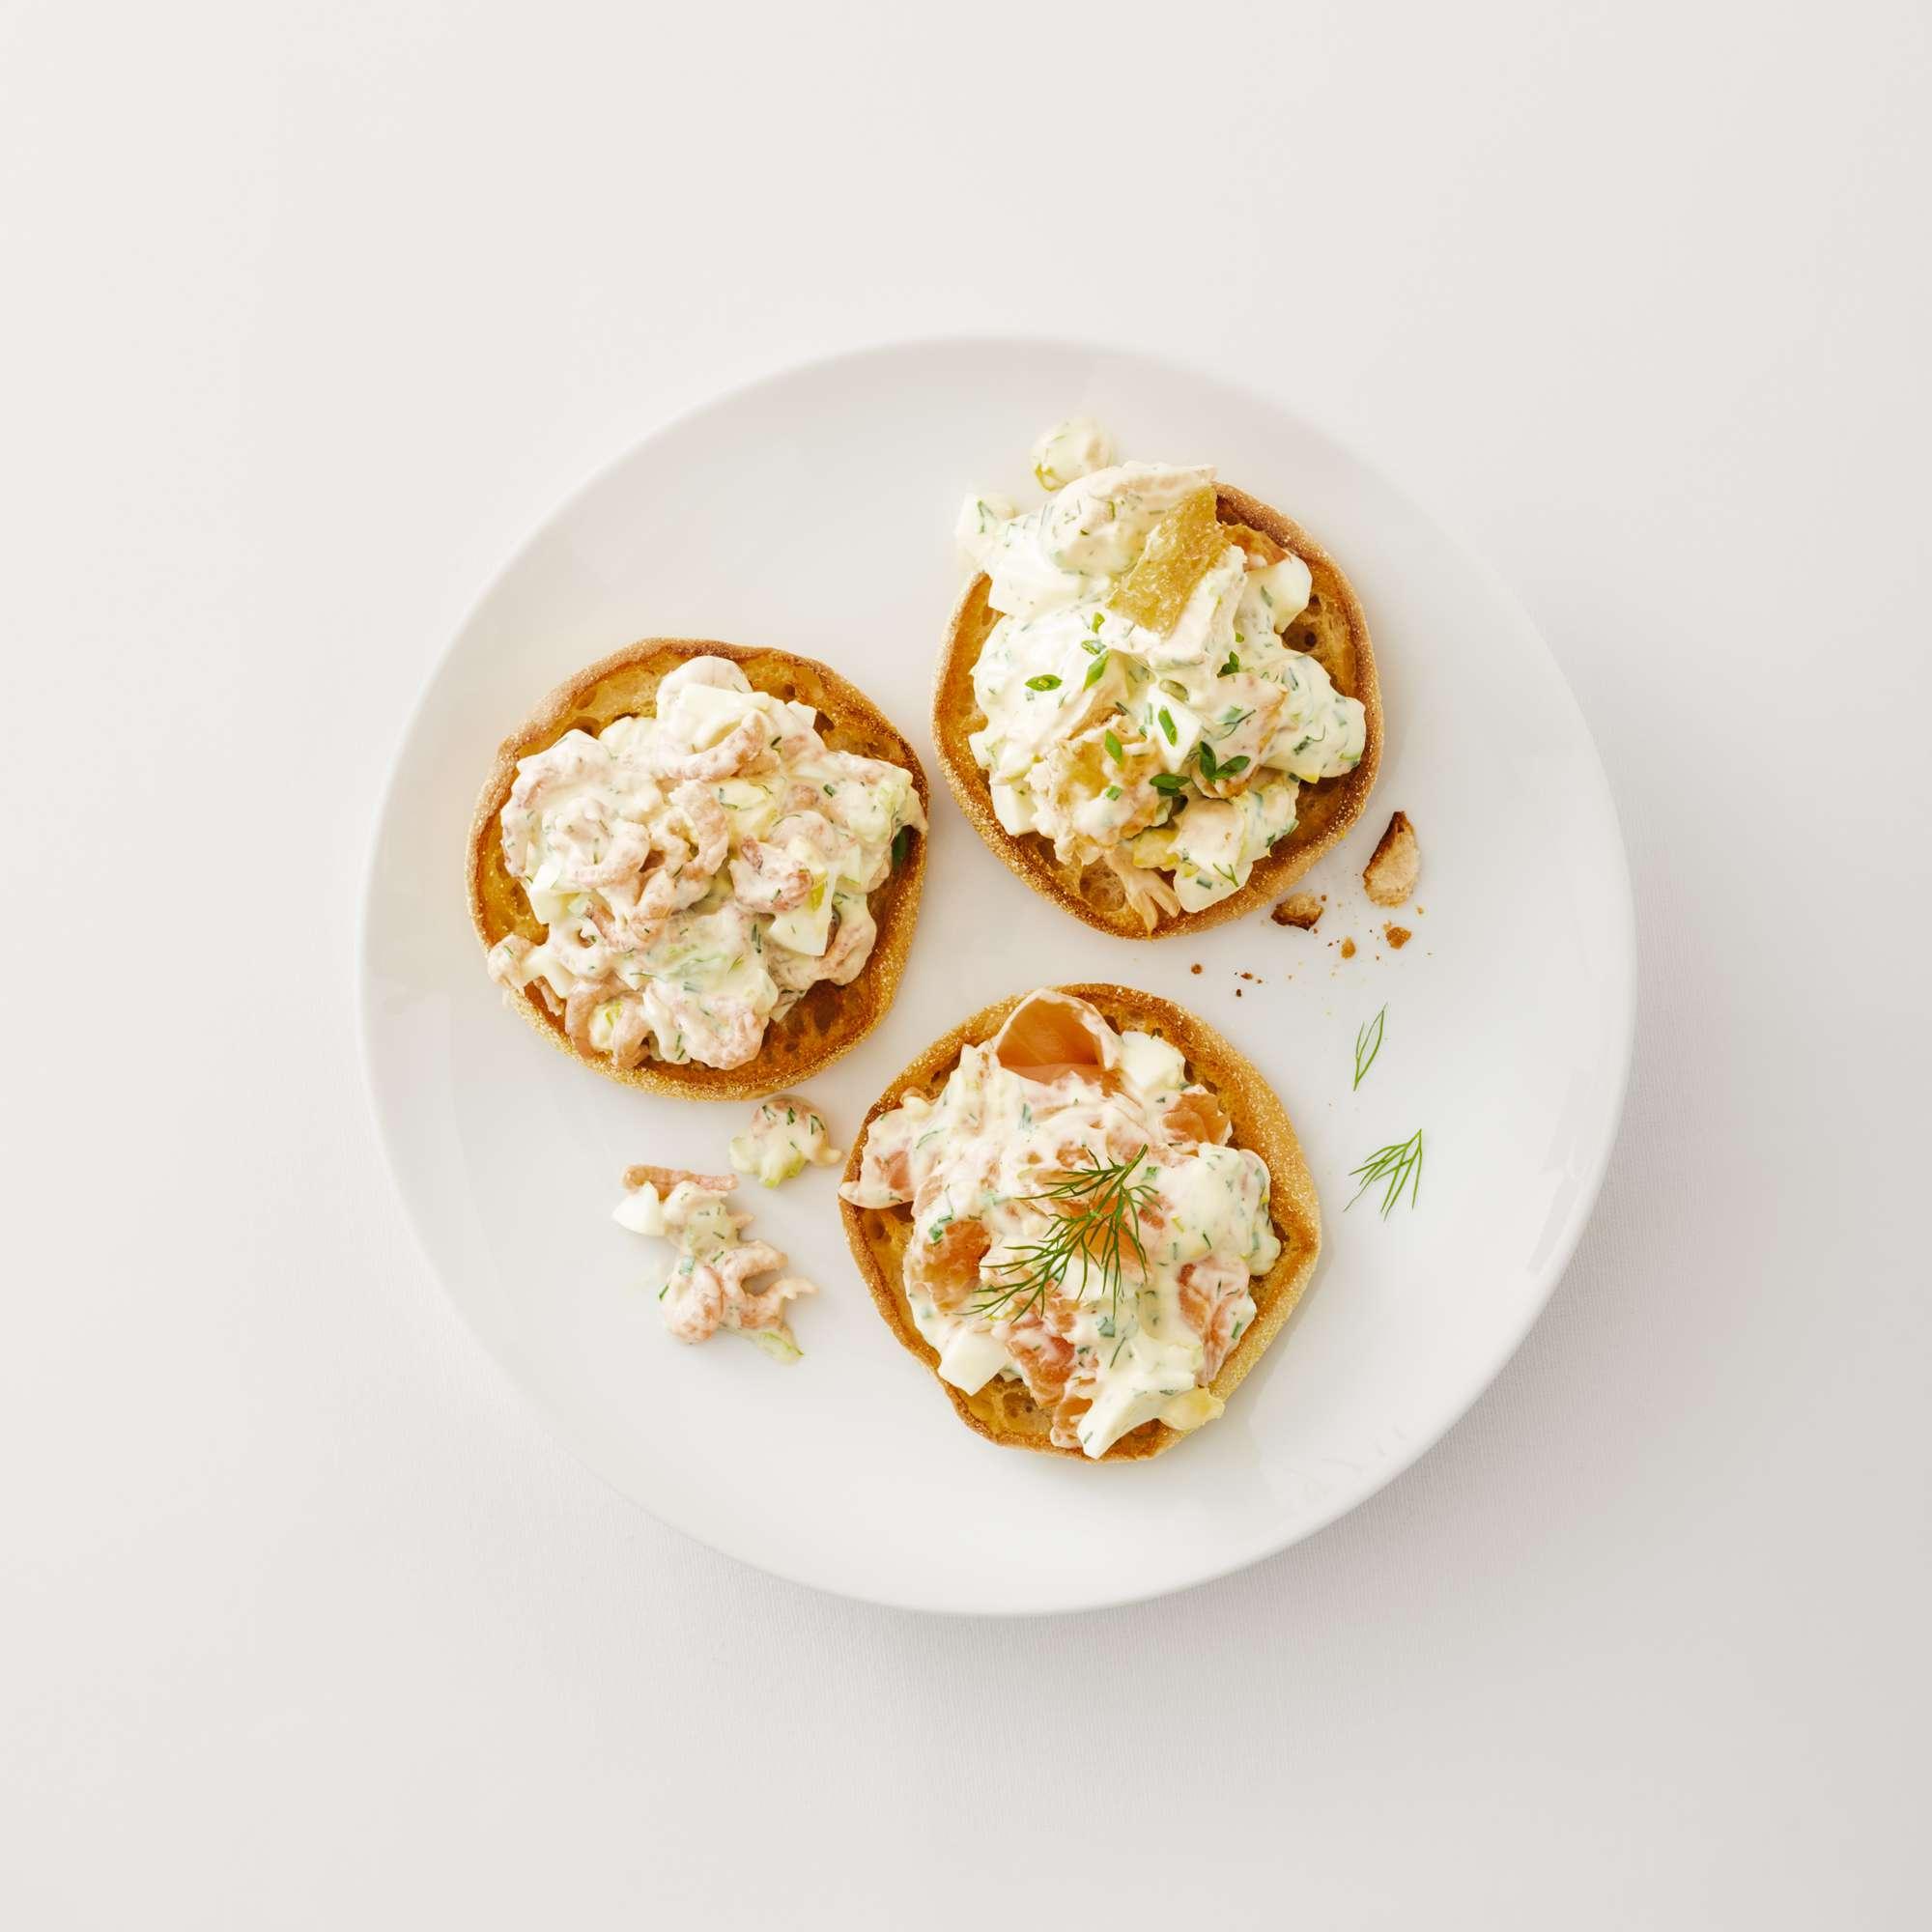 Die-Ostereier-müssen-weg-Salat